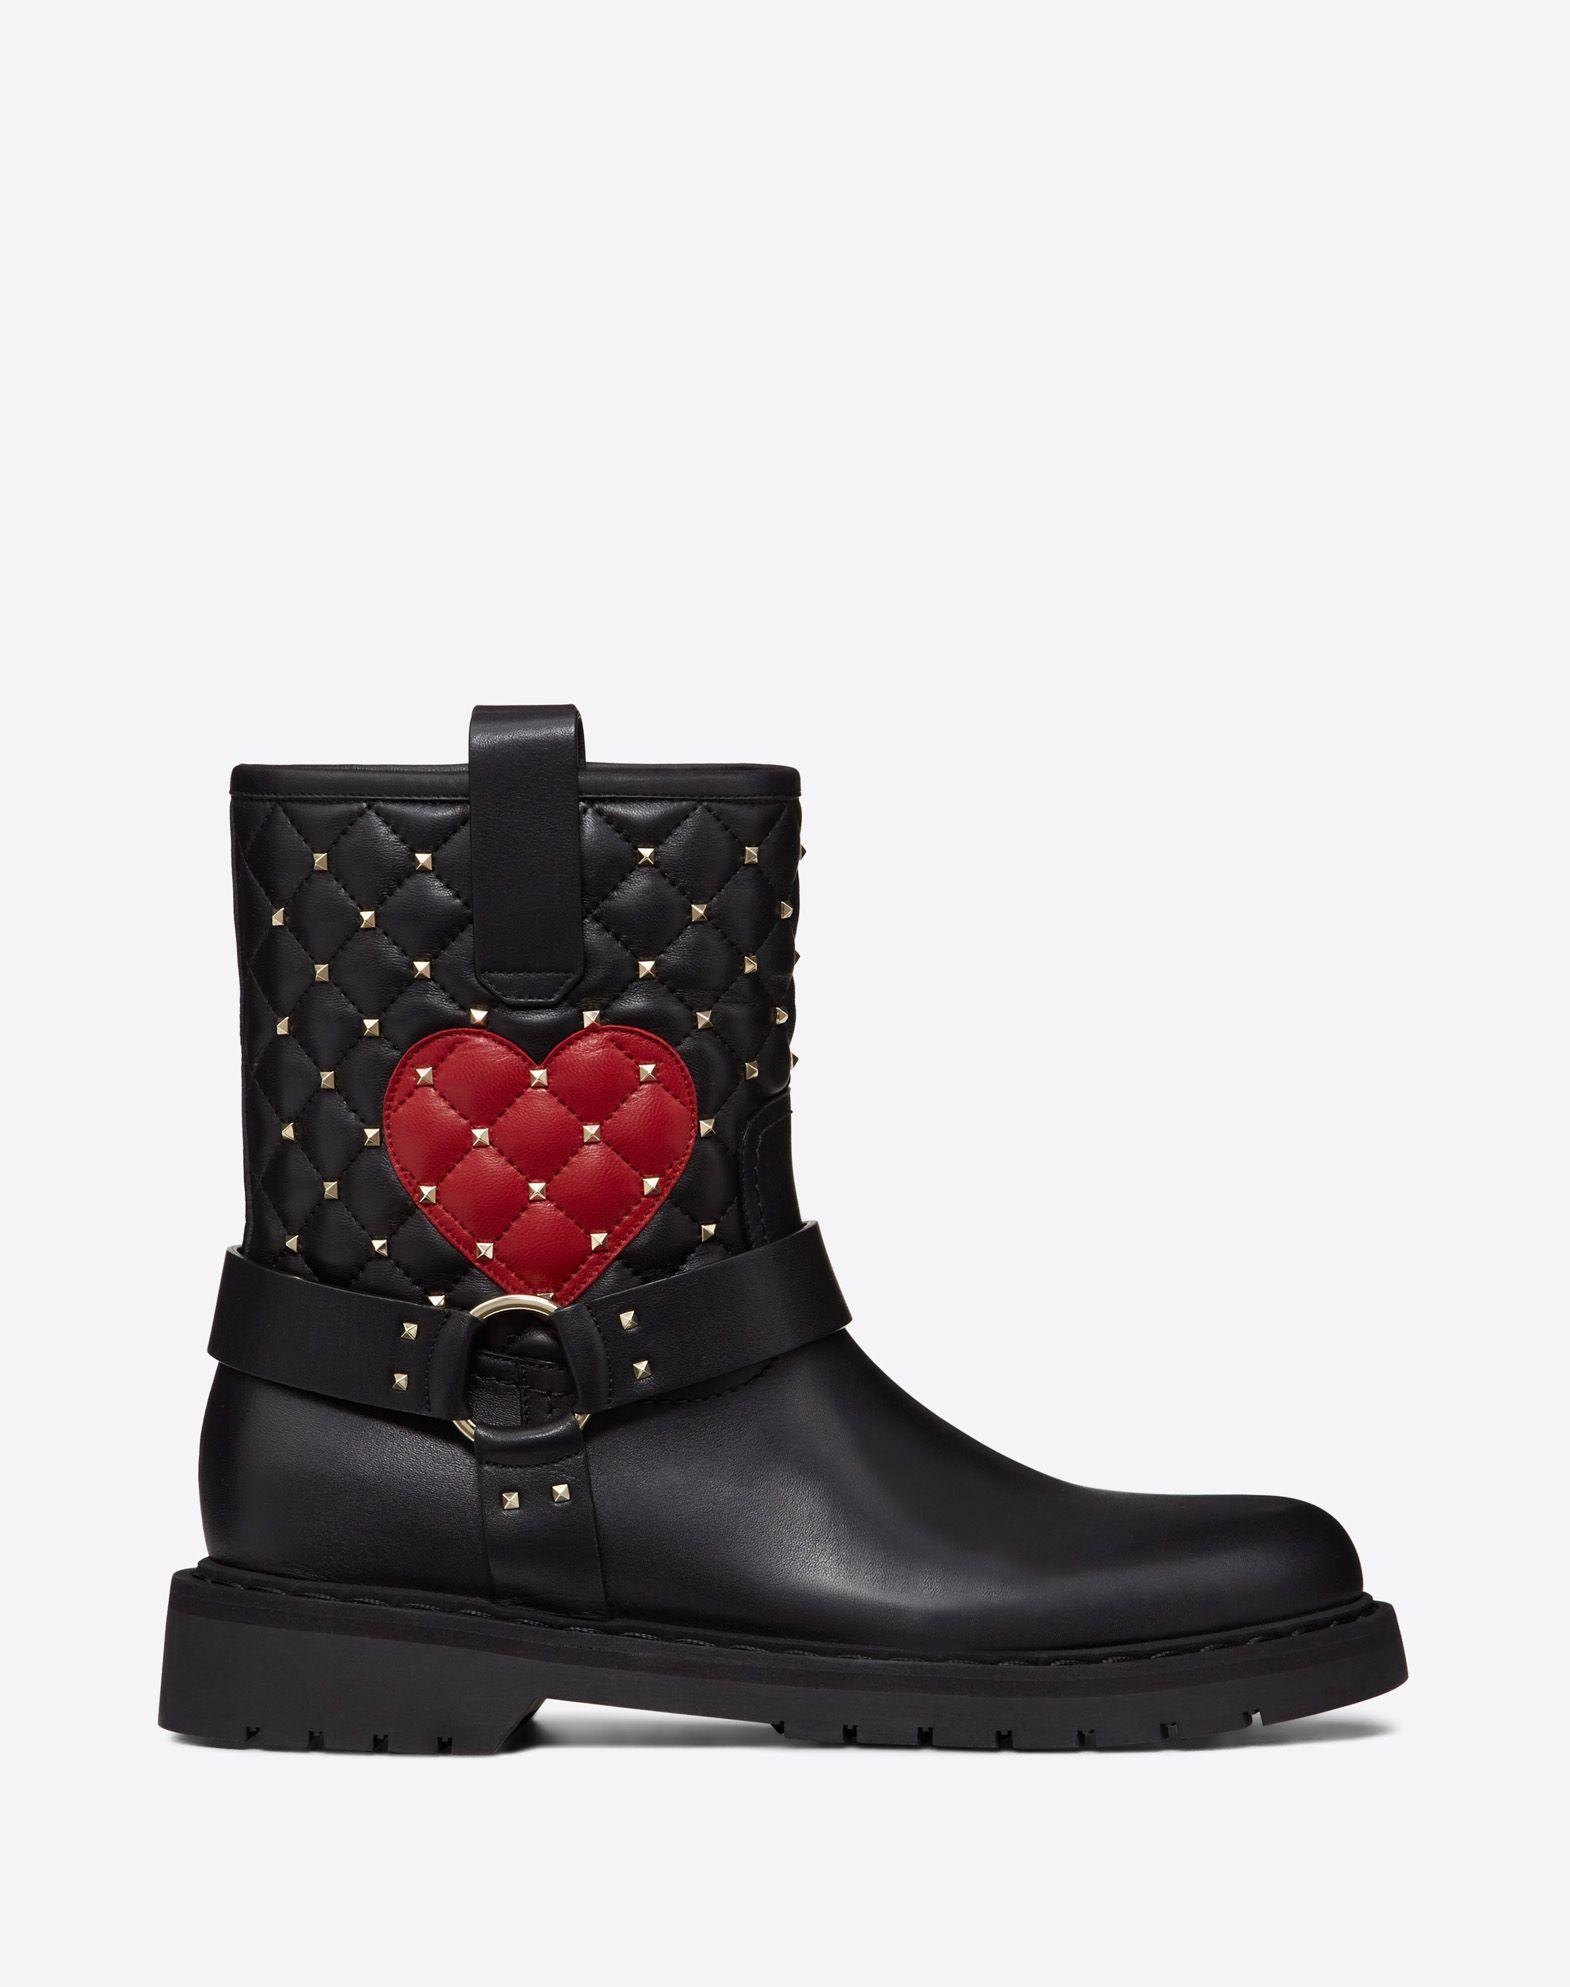 Rockstud Spike biker boot with heart embroidery